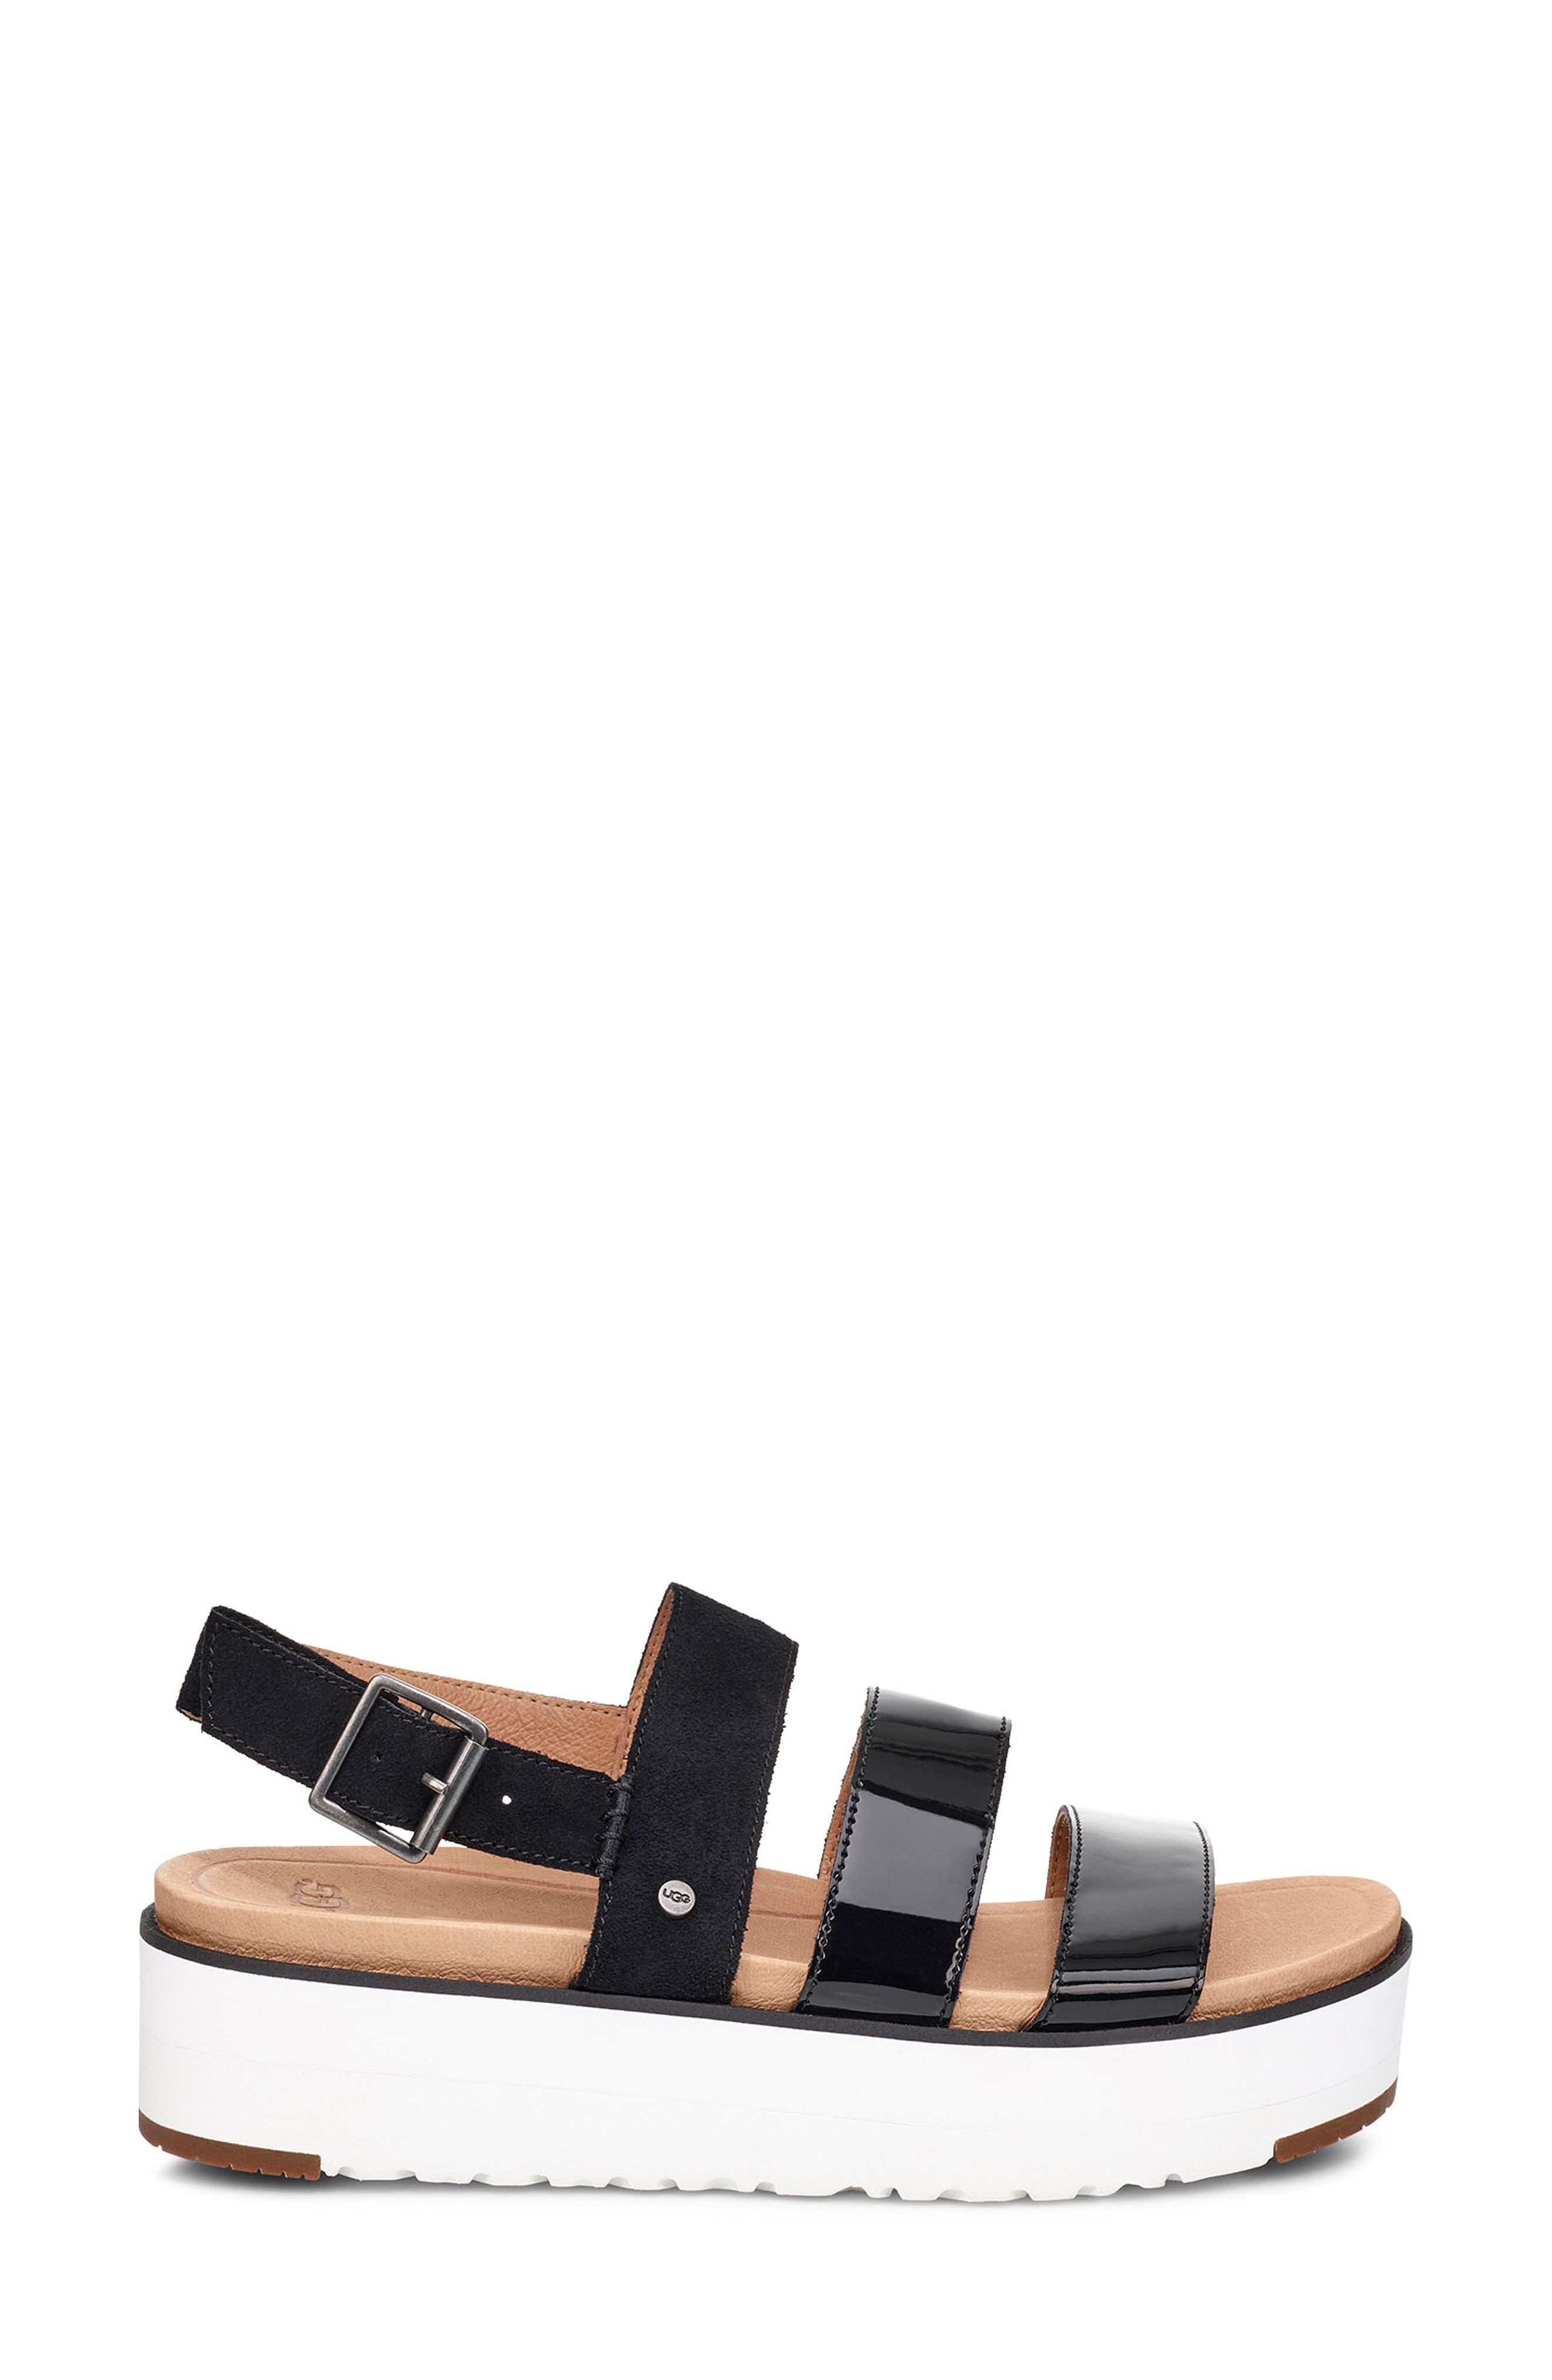 Braelynn Flatform Sandal,                             Alternate thumbnail 3, color,                             BLACK LEATHER